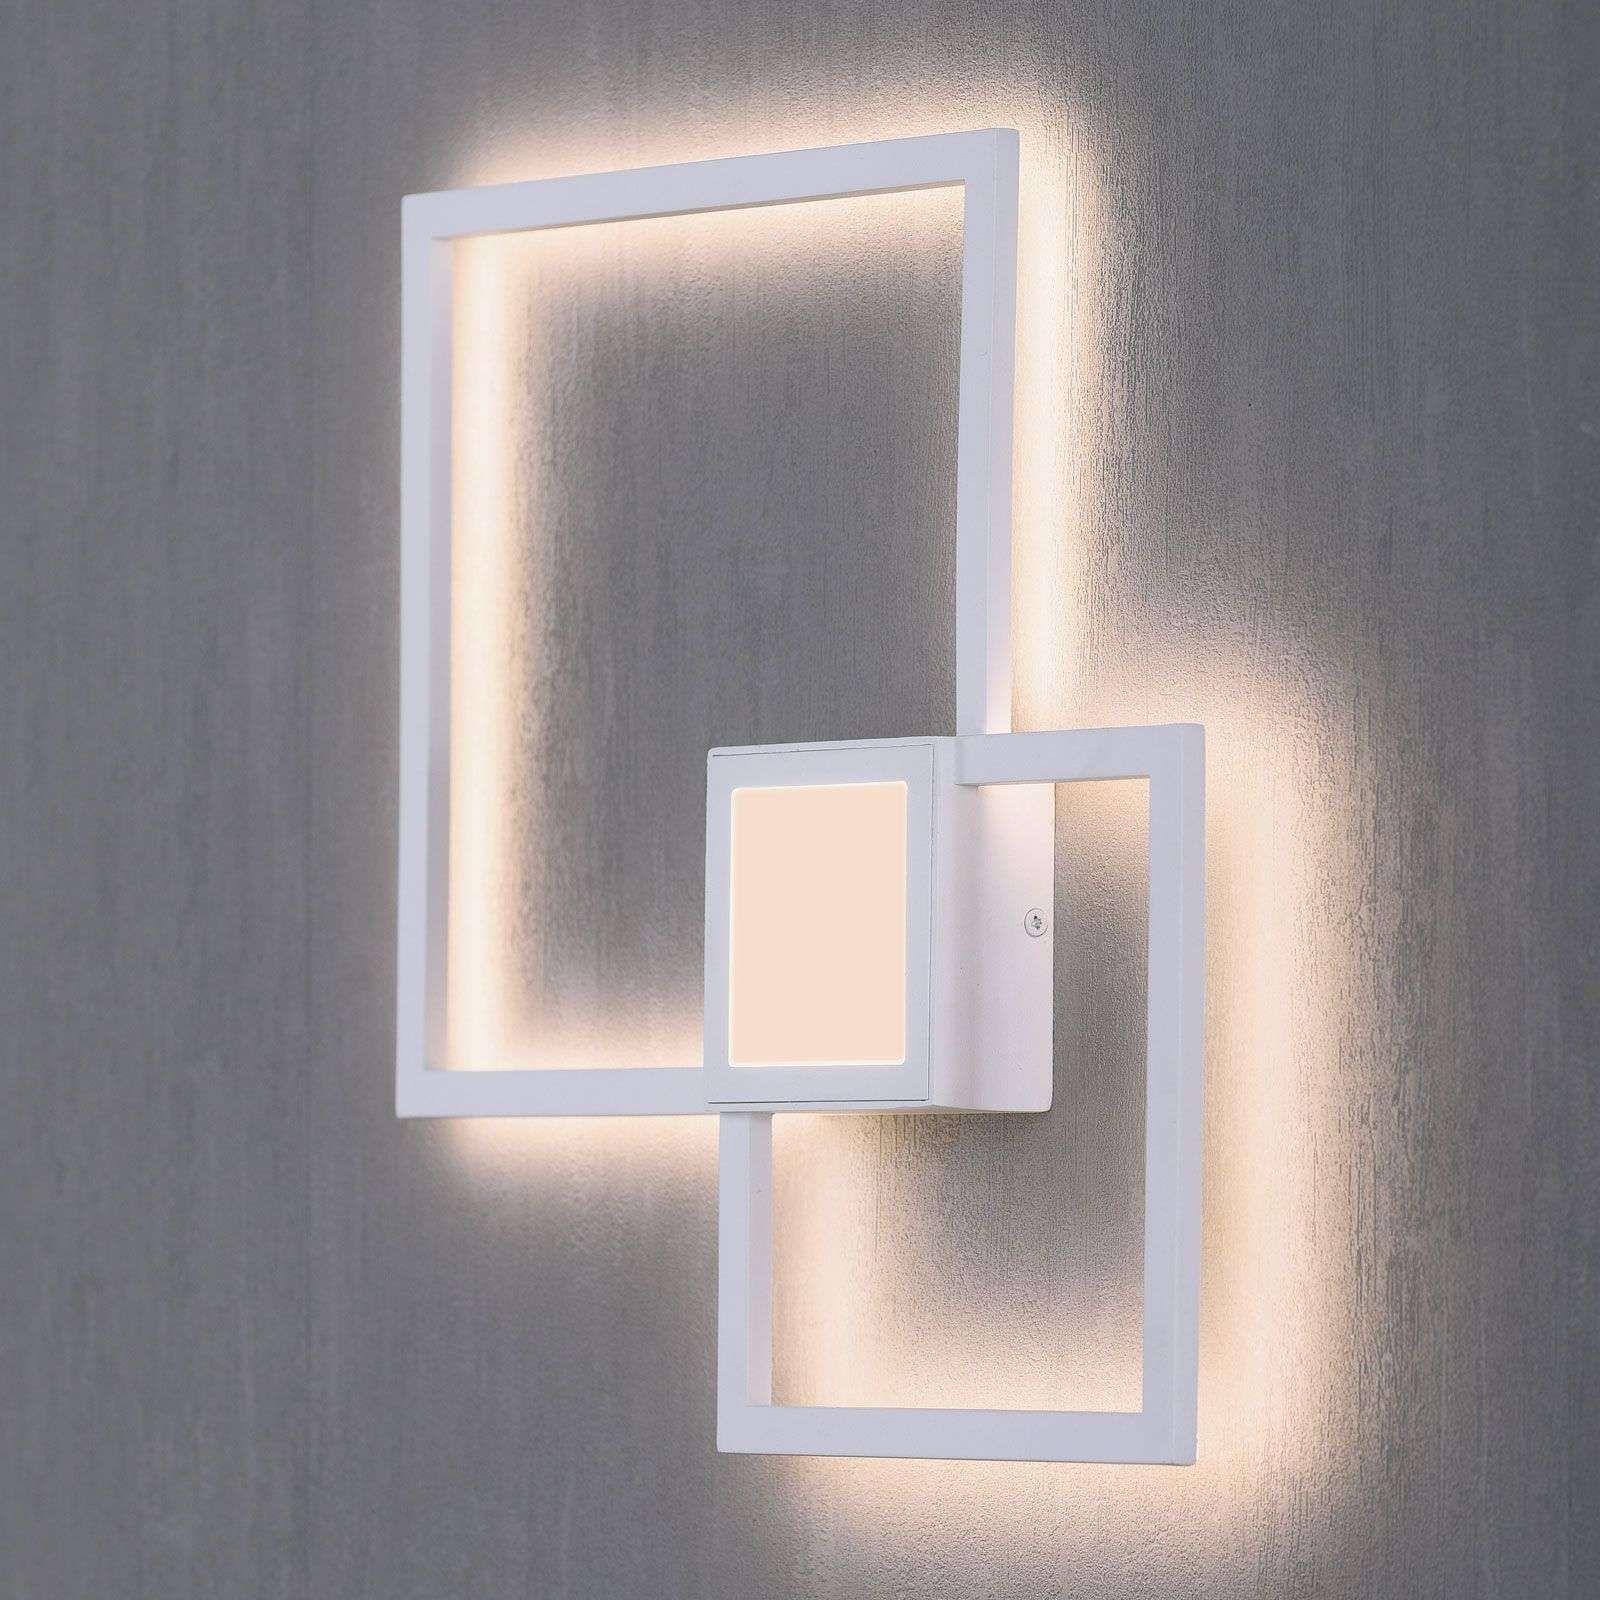 Wandlamp Zwart Koper Wandlampe Kinderzimmer Stern Wandlampe Mit Stecker Und Kabel Led Wandlampen 12v Wan In 2020 Wandlamp Wandverlichting Indirecte Verlichting